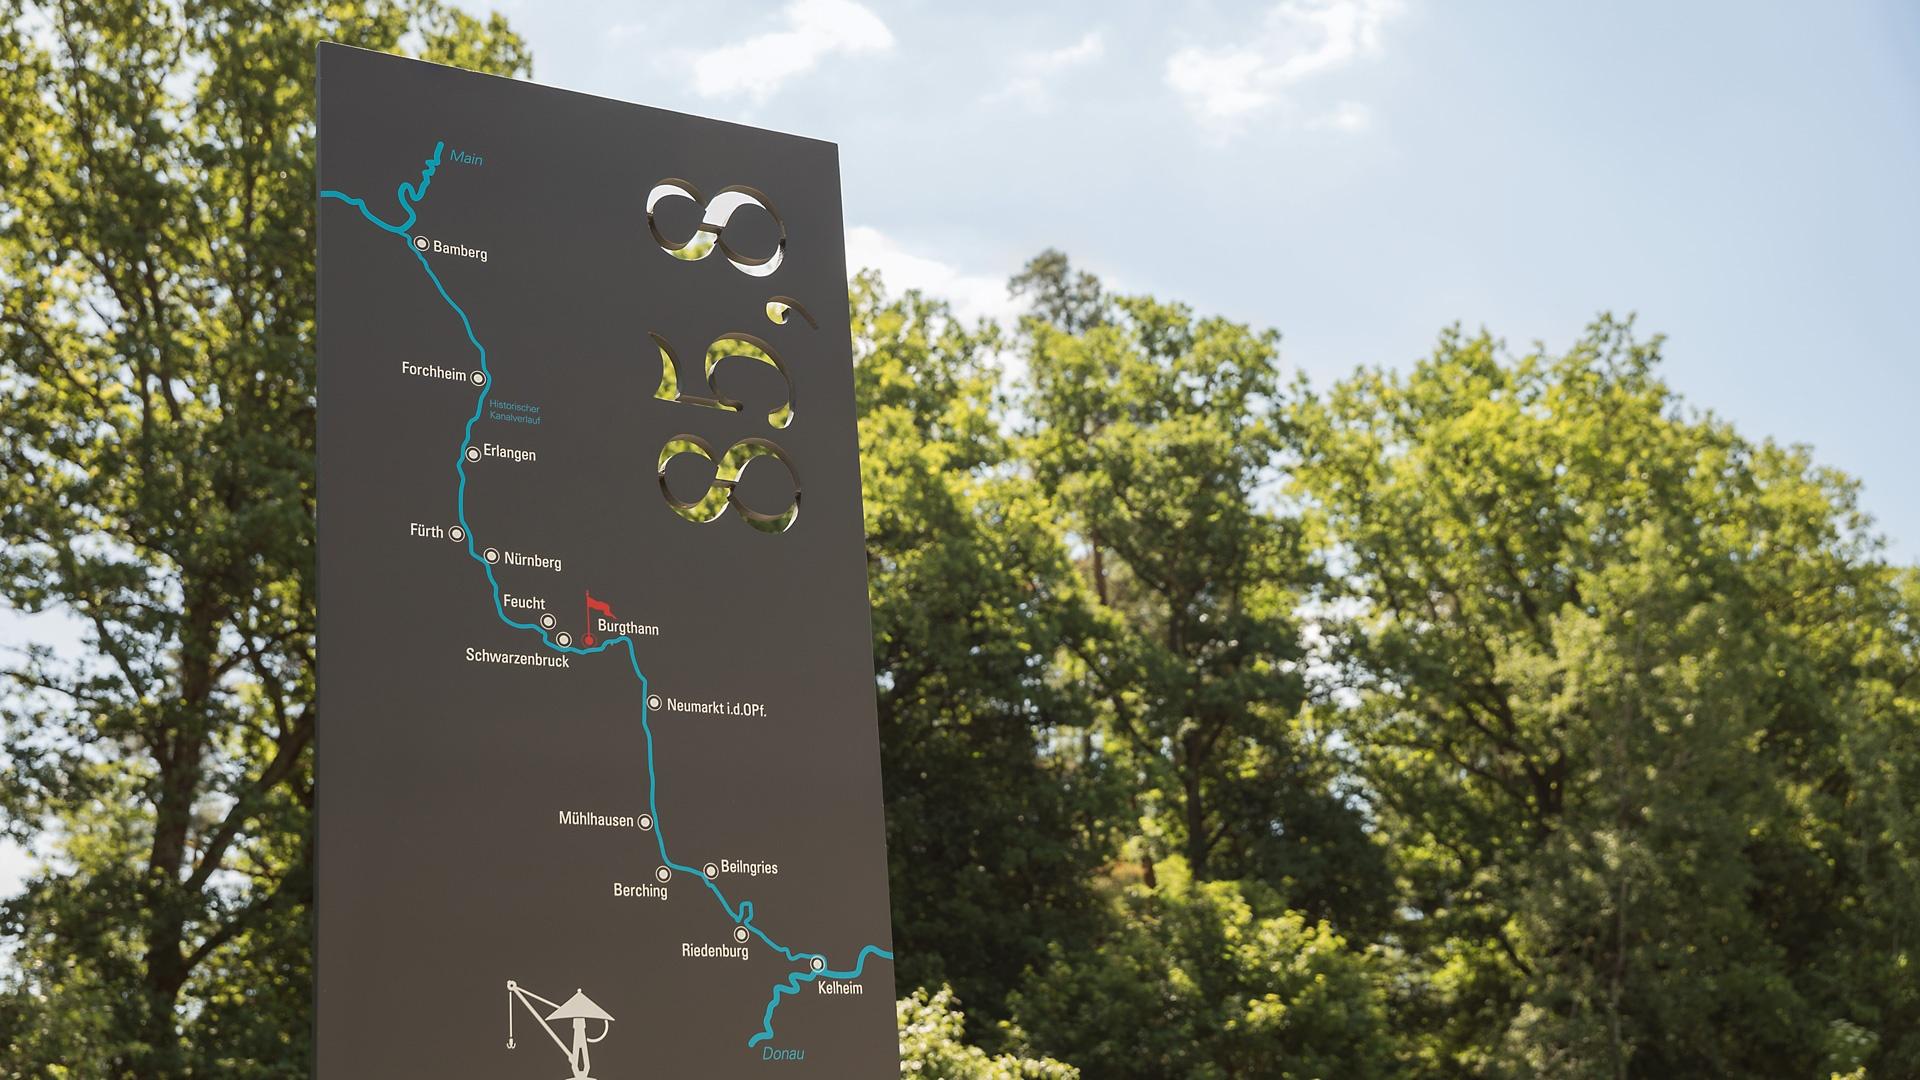 Informationssystem am Ludwig-Donau-Main-Kanal